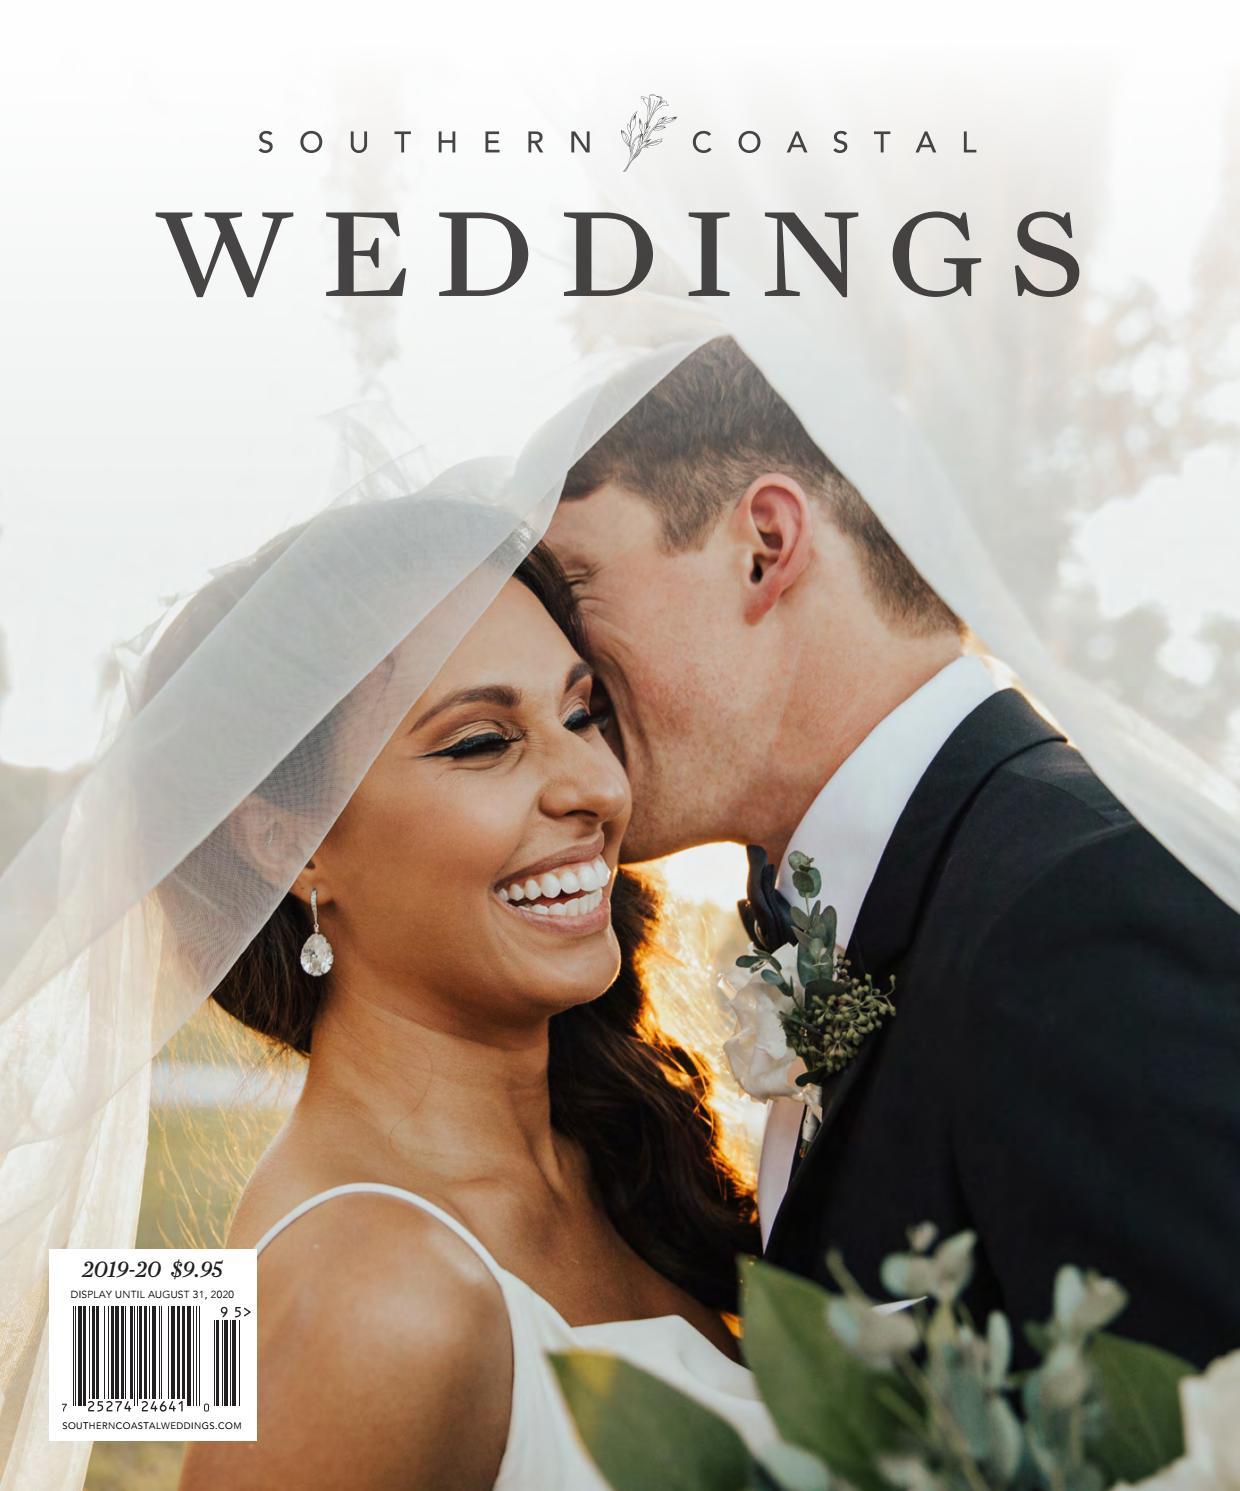 Southern Coastal Weddings 2019 by Savannah Magazine - issuu